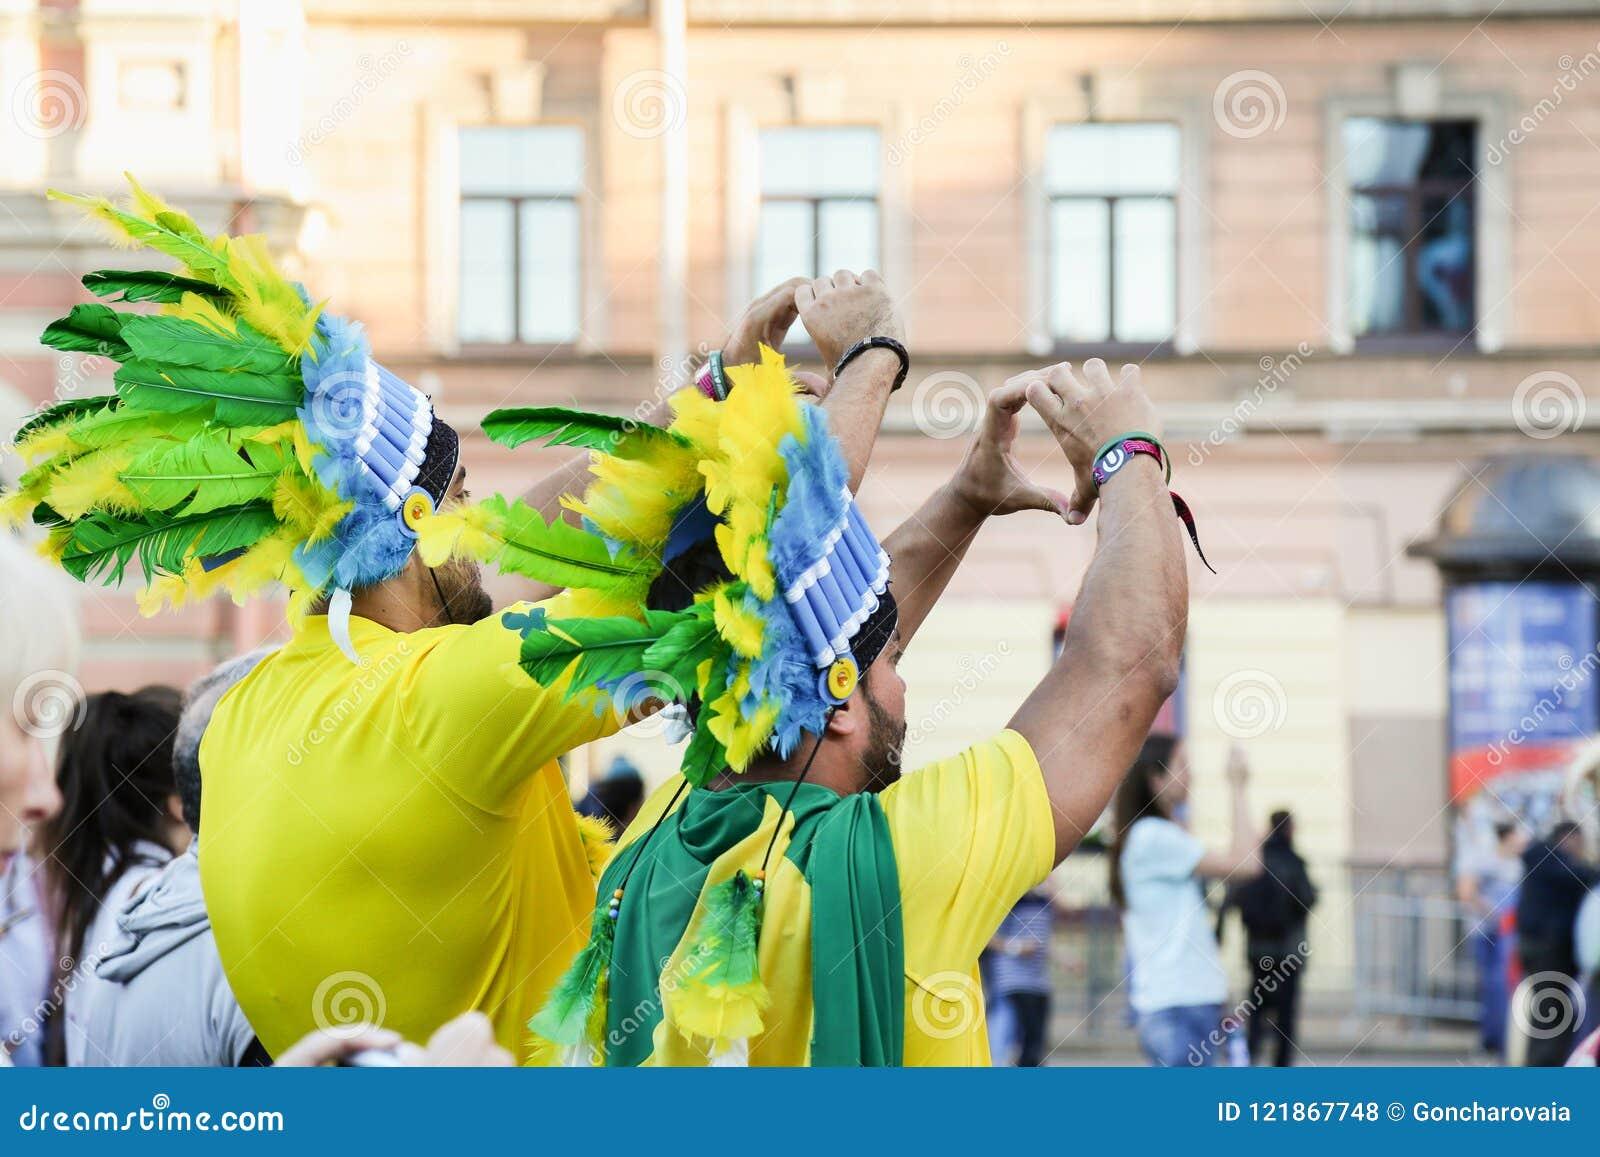 Brazilian soccer fans at FIFA World Cup.